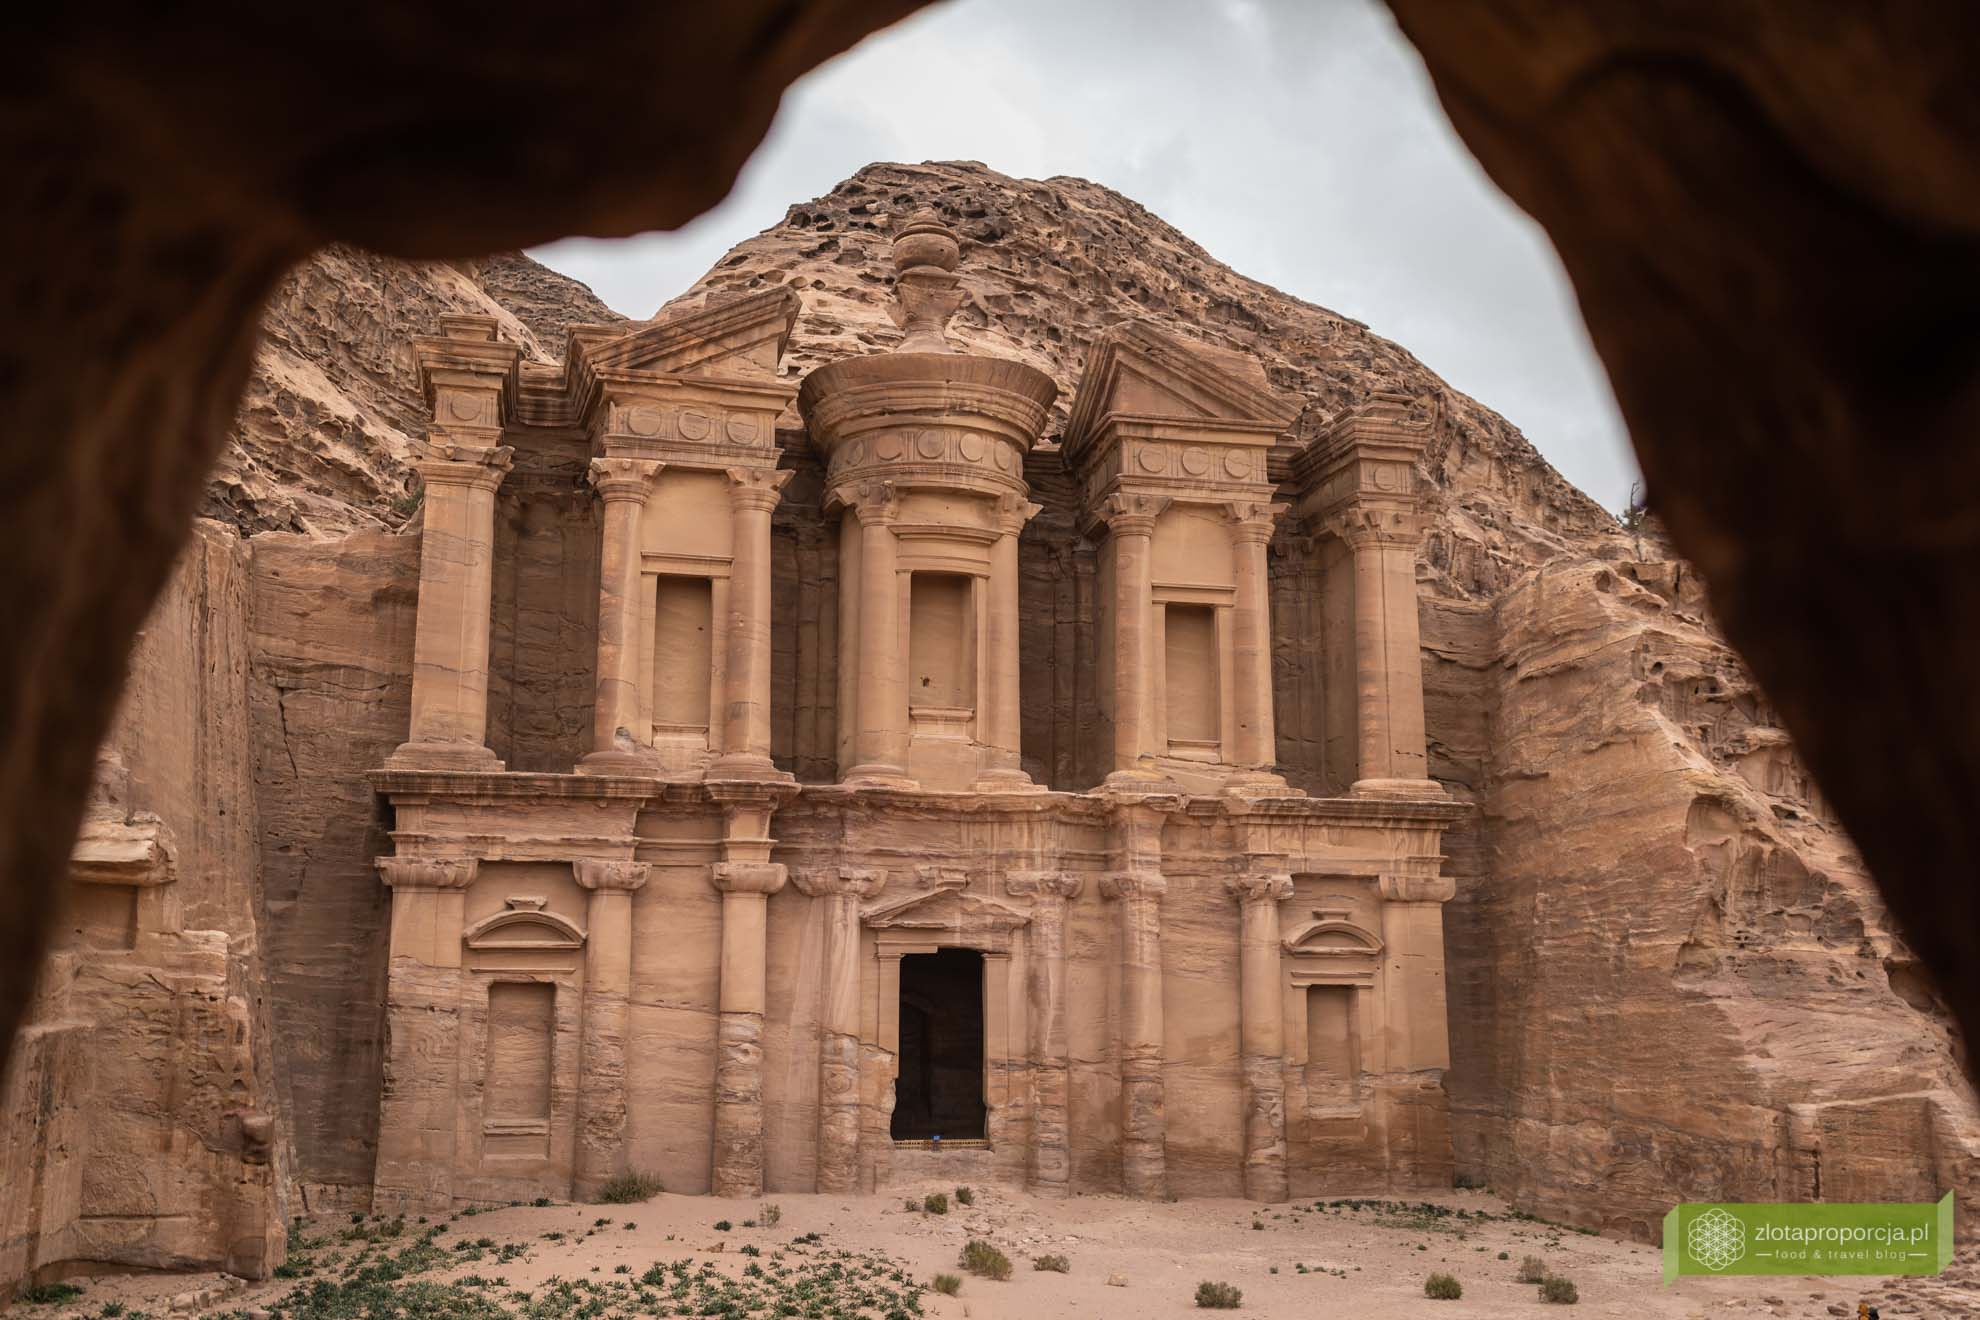 Petra; Jordania; atrakcje Petry; miasto wykute w skale; Petra Jordania; Petra cud świata; miasto Nabatejczyków; Klasztor Petra; Ad Dajr; Klasztor punkt widokowy jaskinia